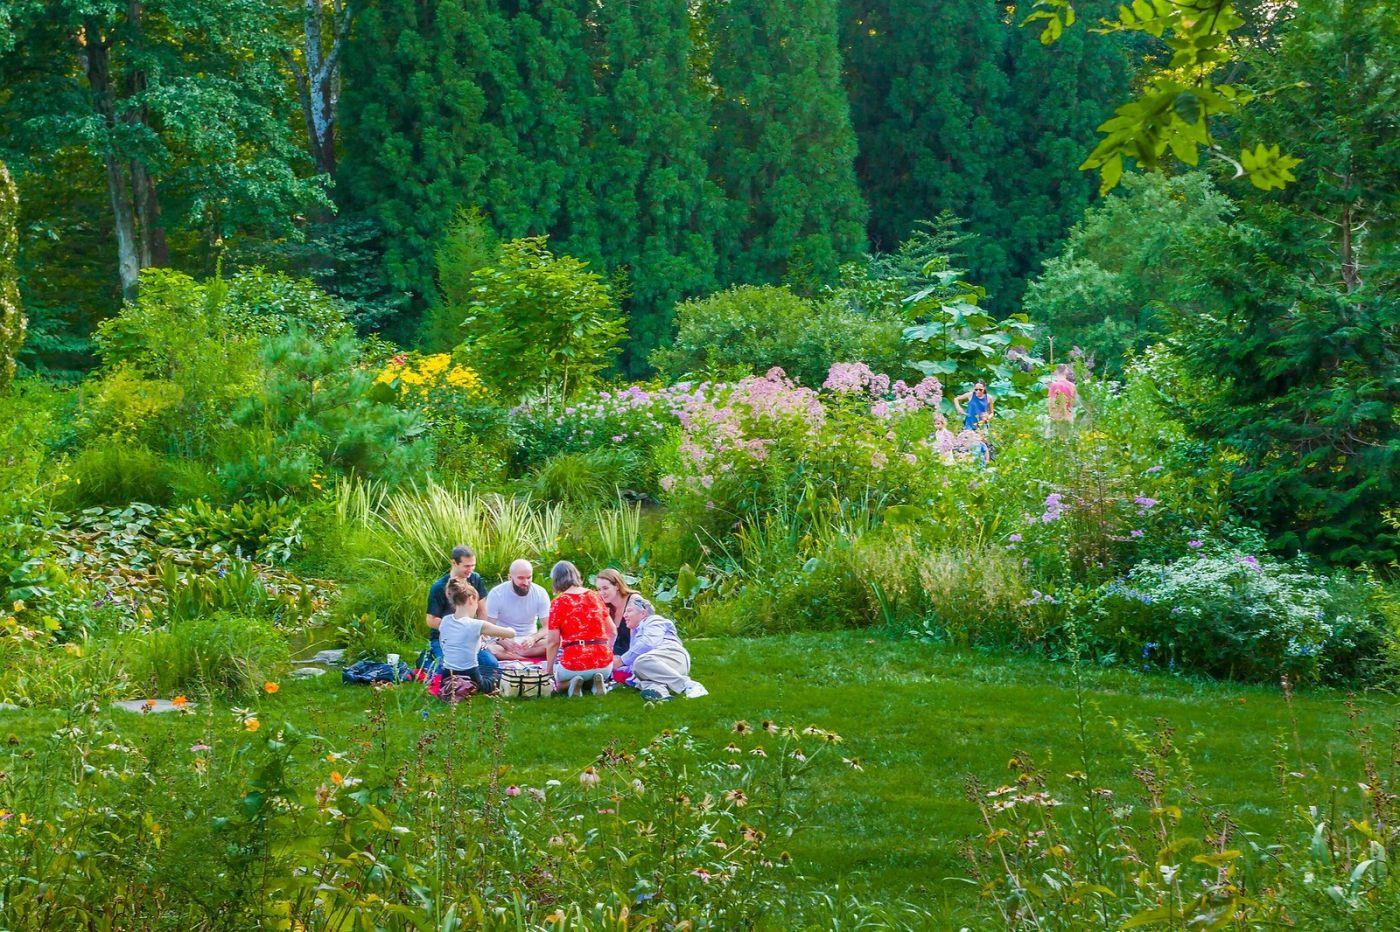 Chanticleer花园,享受大自然_图1-19